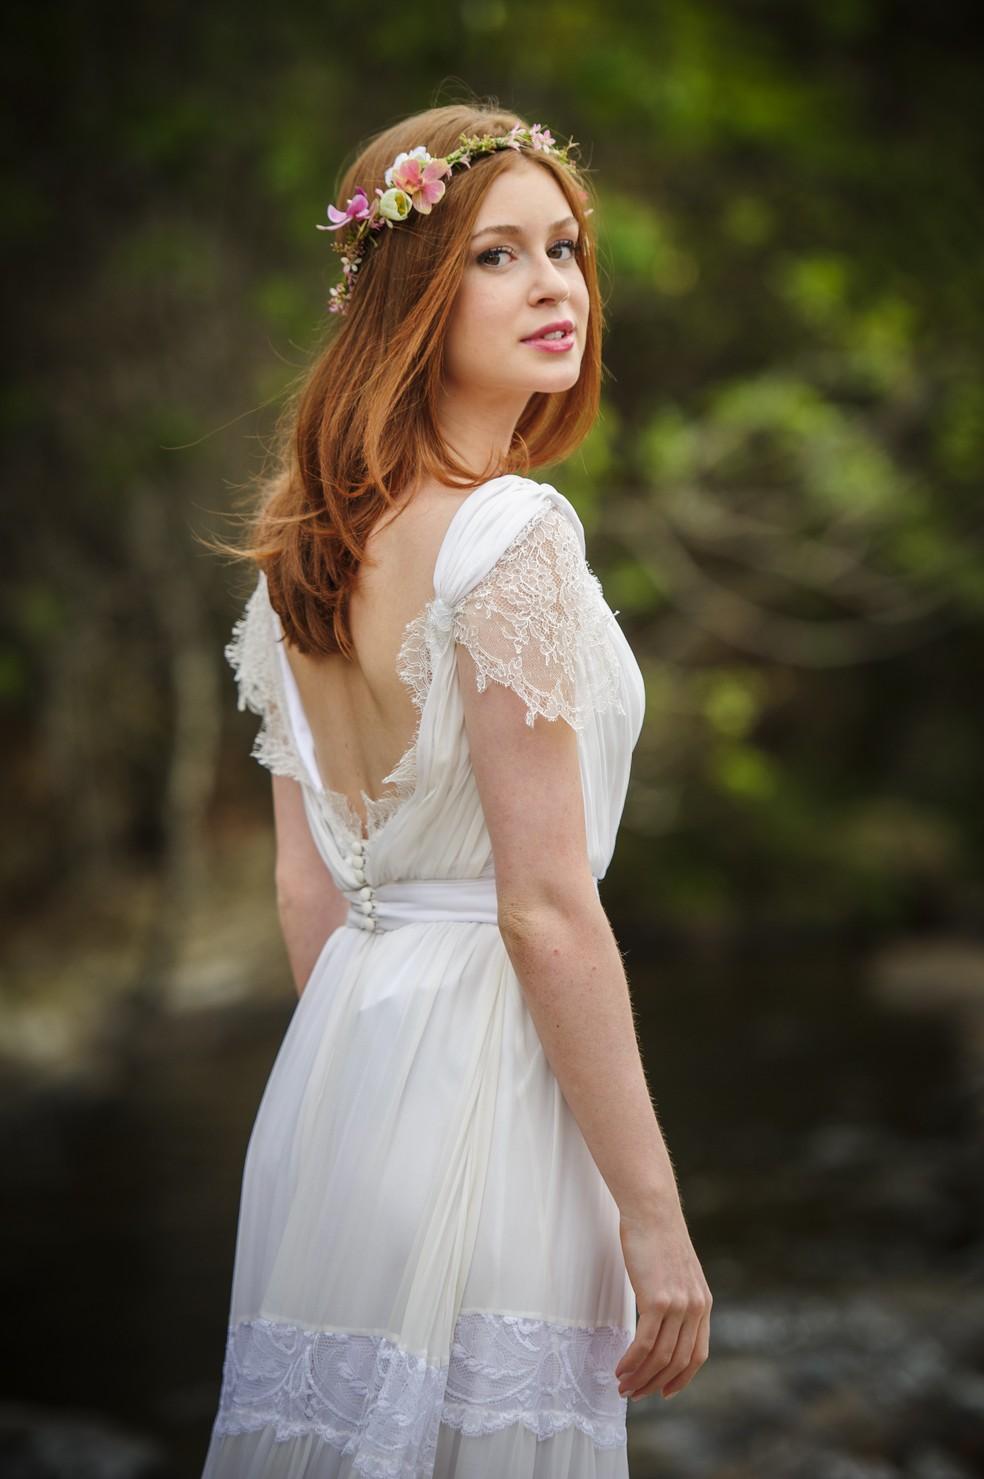 Maria Isis (Marina Ruy Barbosa) usou vestida dado por José Alfredo (Alexandre Nero) no dia do seu casamento - 'Império' — Foto: Globo